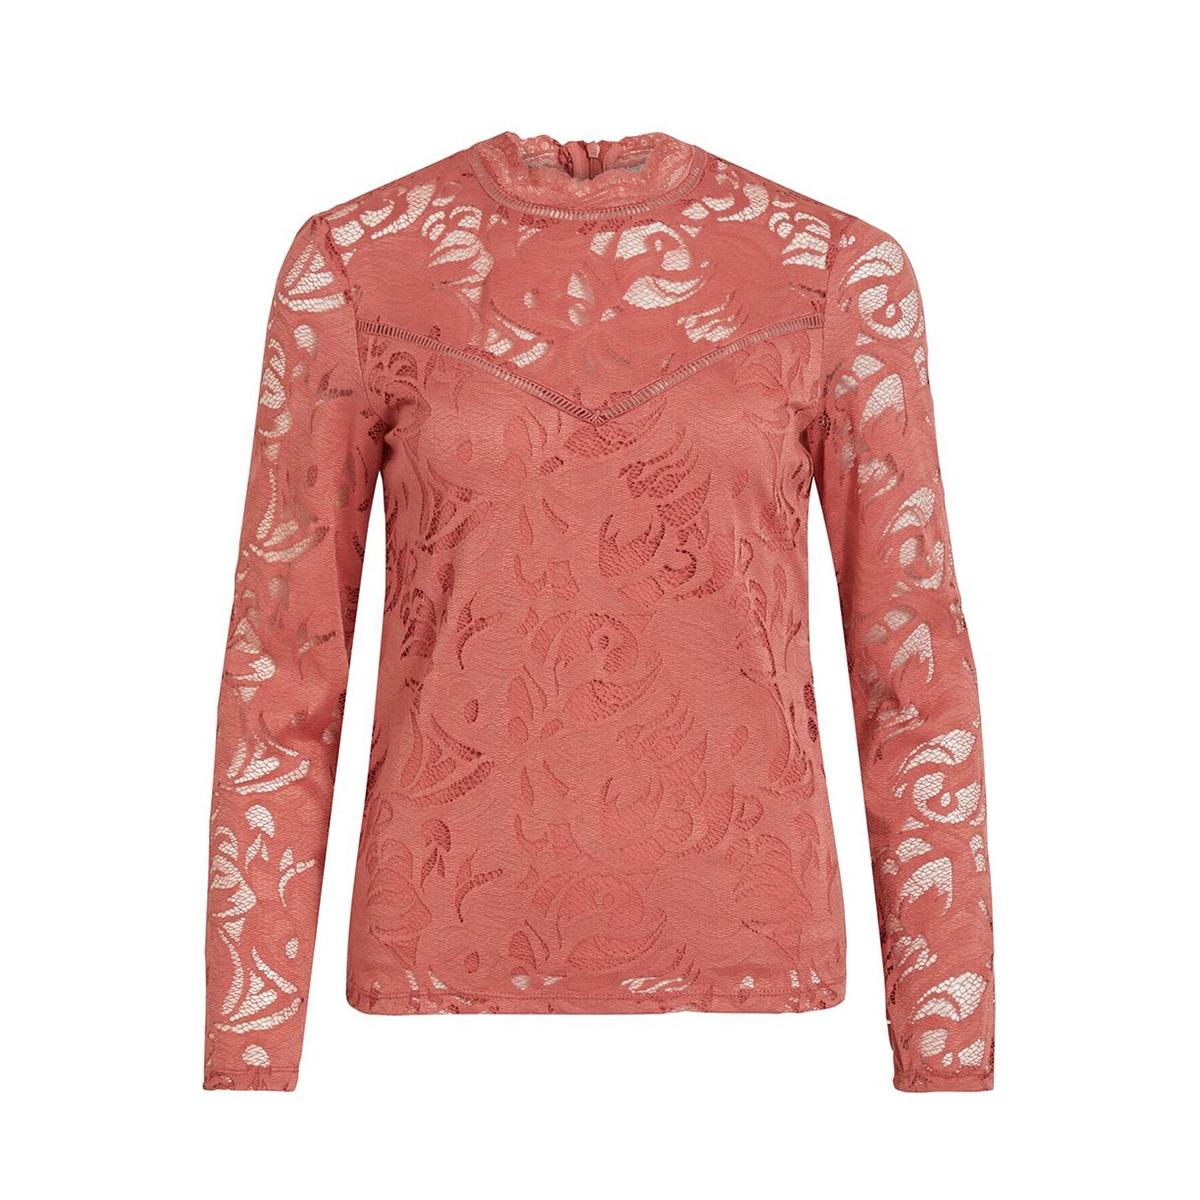 vistasia l/s lace top-fav 14044847 vila blouse dusty cedar